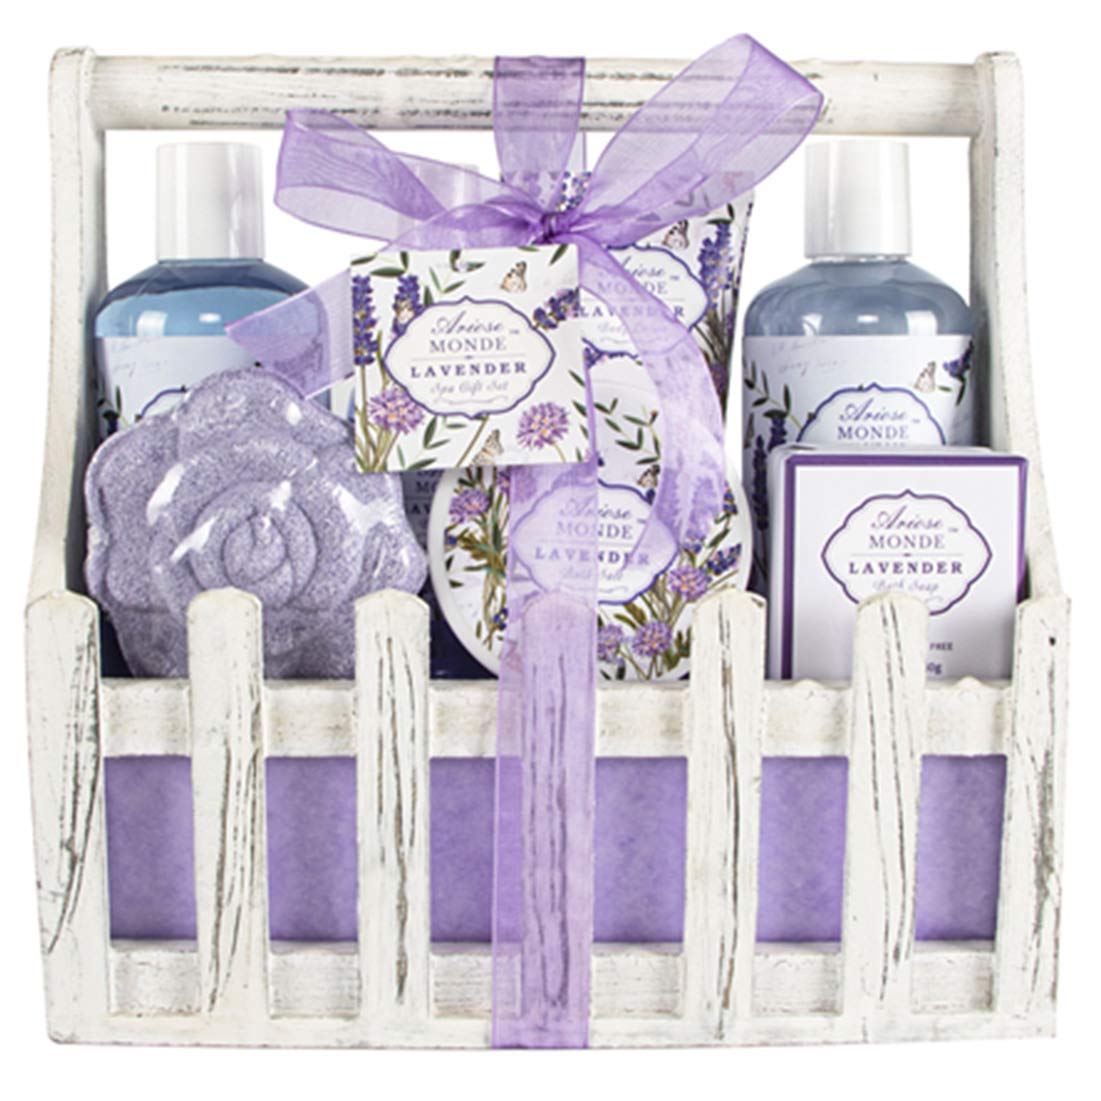 Bath Spa Basket Gift Set, with Lavender & Jasmine Scent, Home Spa Gift Basket Kits for Women, Includes Body Lotion, Shower Gel, Bath Salts, Bubble Bath, Body Mist, Bath Soap, Bath Bomb, 8 PCS